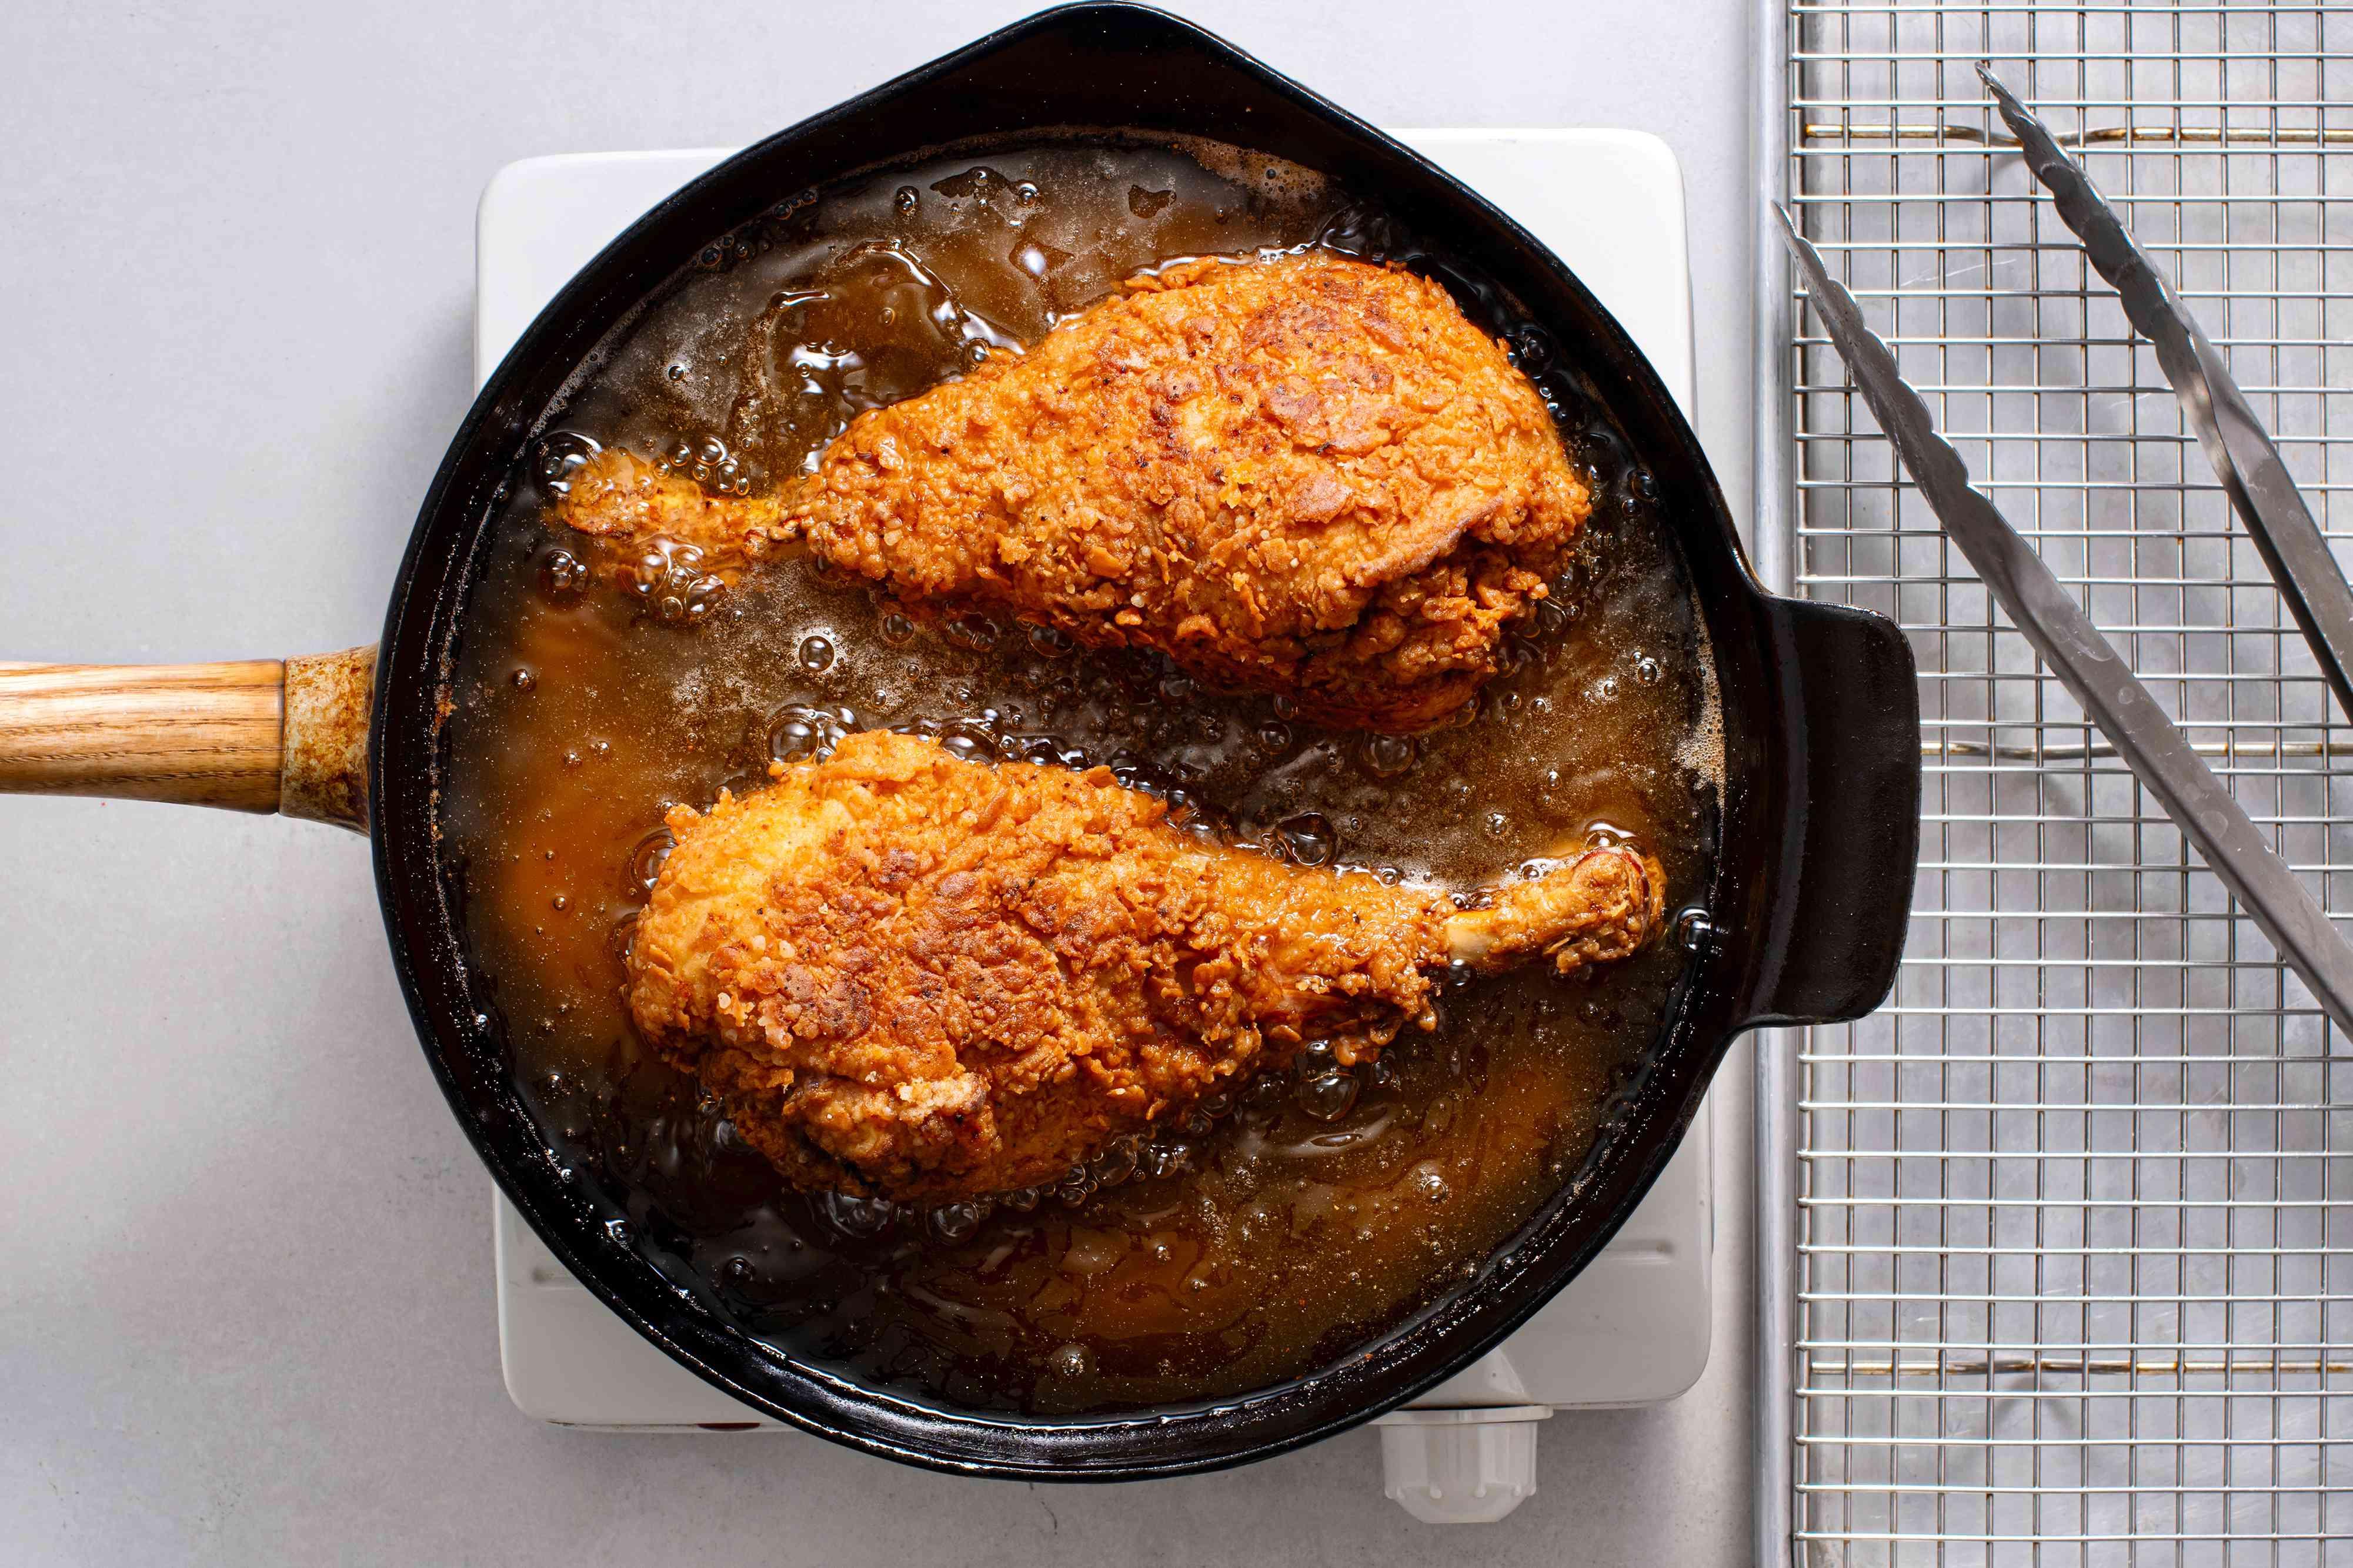 turkey frying in a cast iron skillet